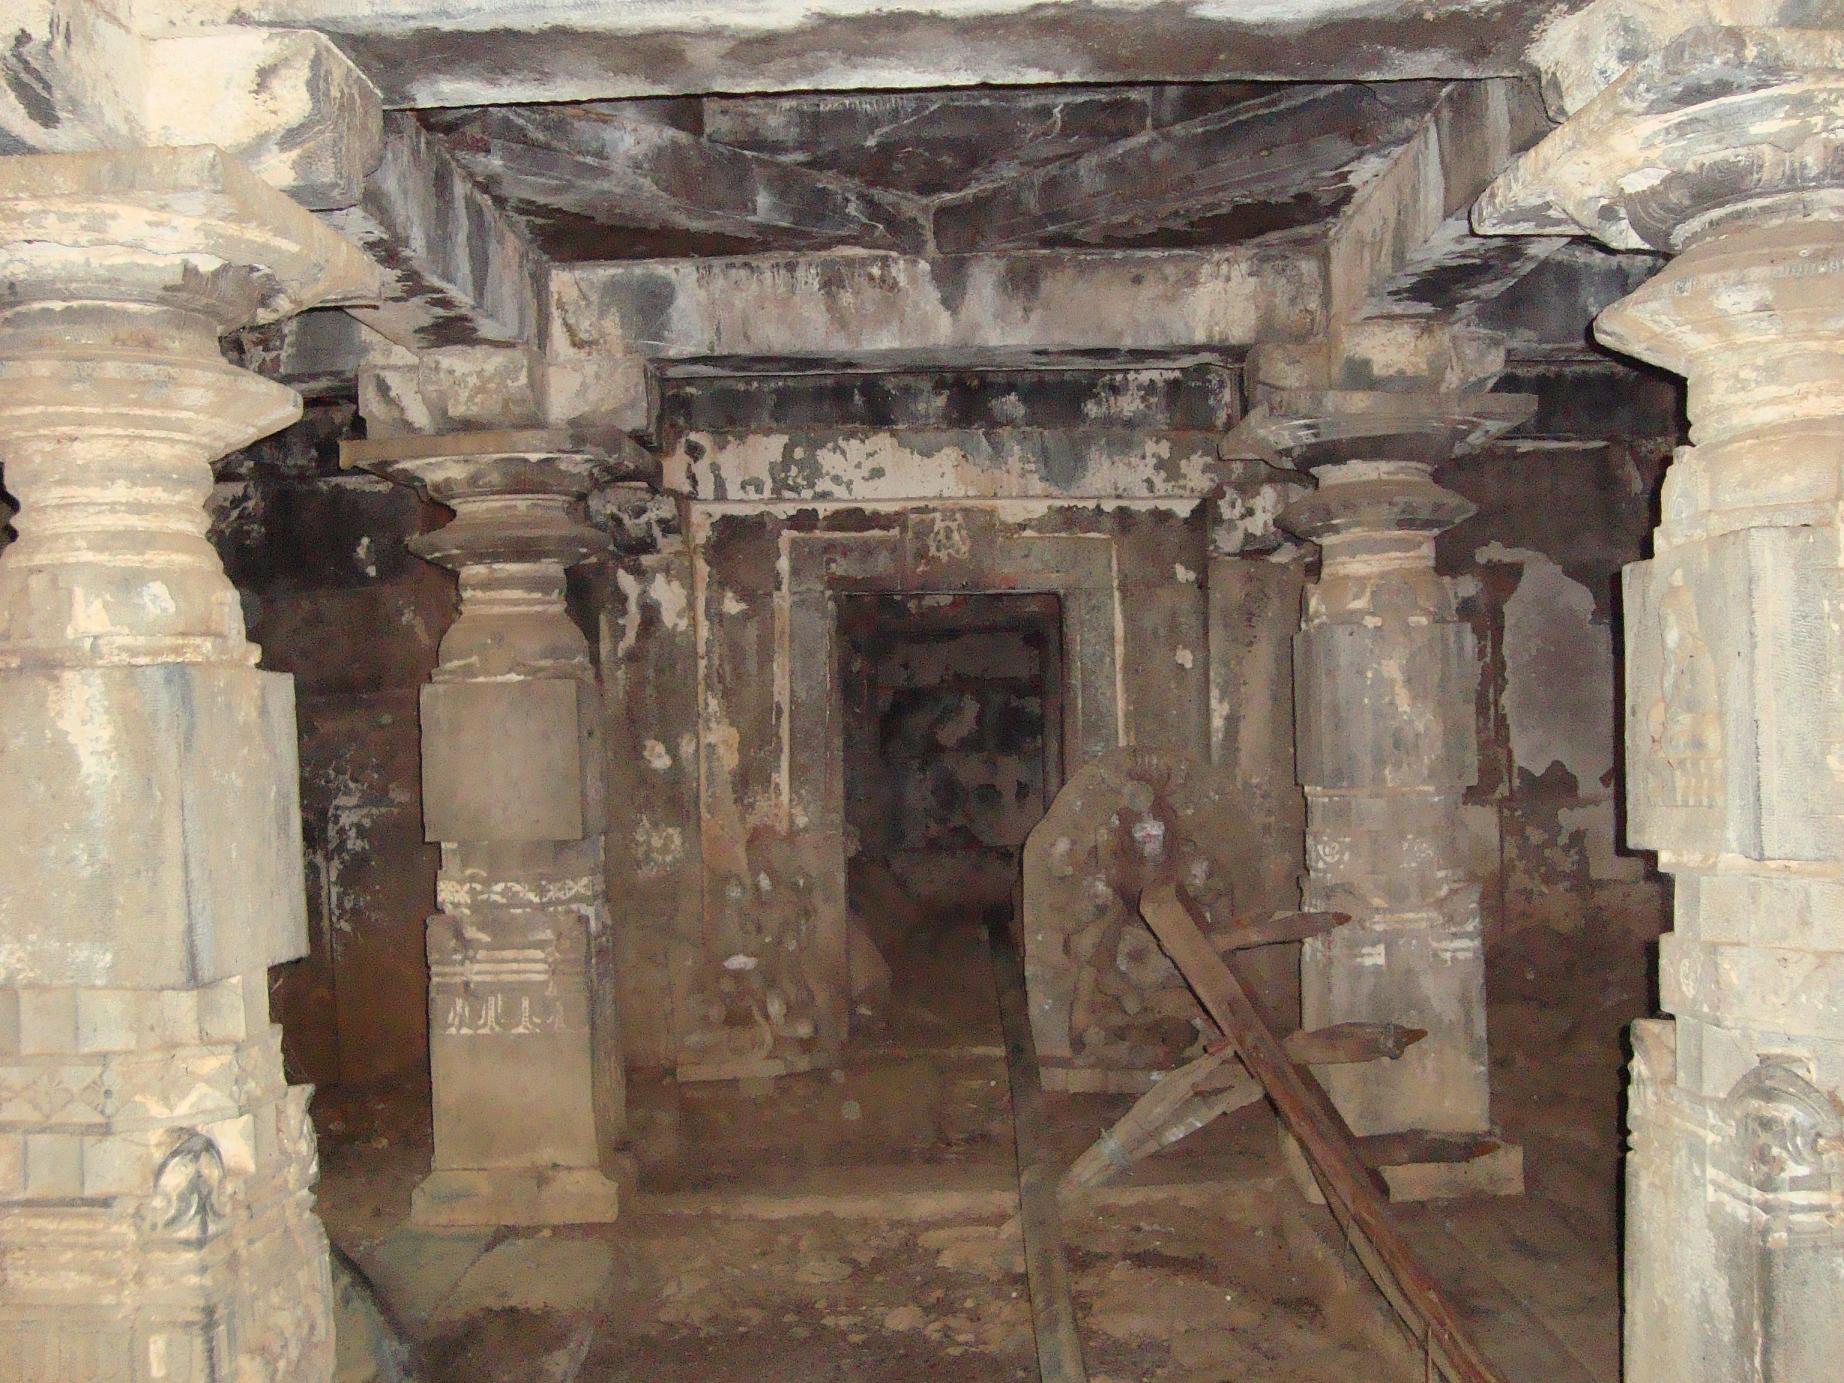 Narasimha temple Narasapura near Chaudayyadanapura, en route to Guttala, Haveri District, North Karnataka